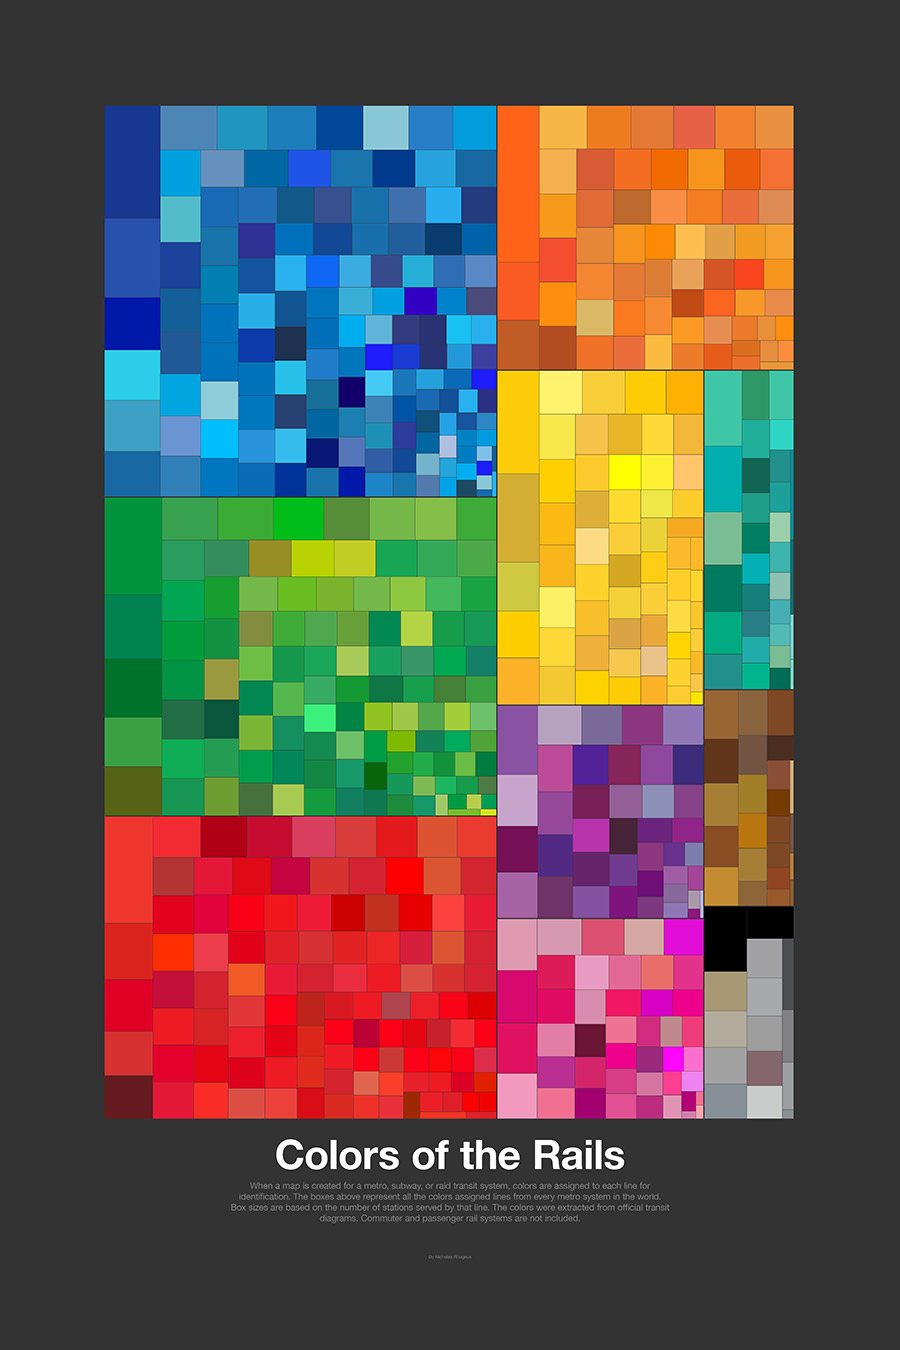 Colors of the Rails (Dark)